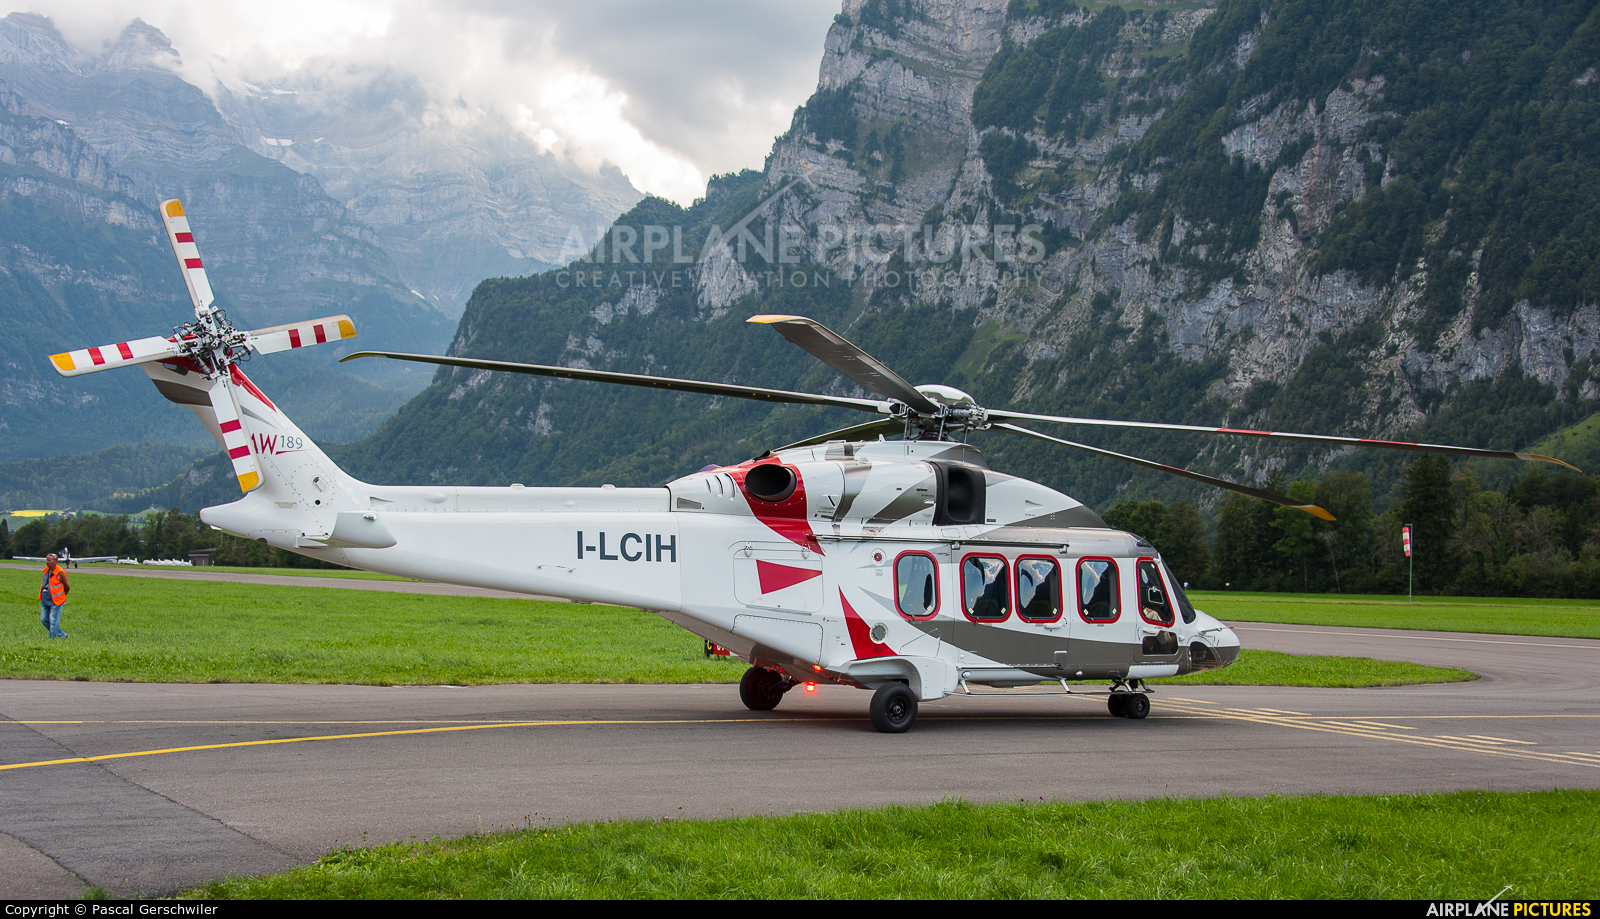 Leonardo I-LCIH aircraft at Mollis